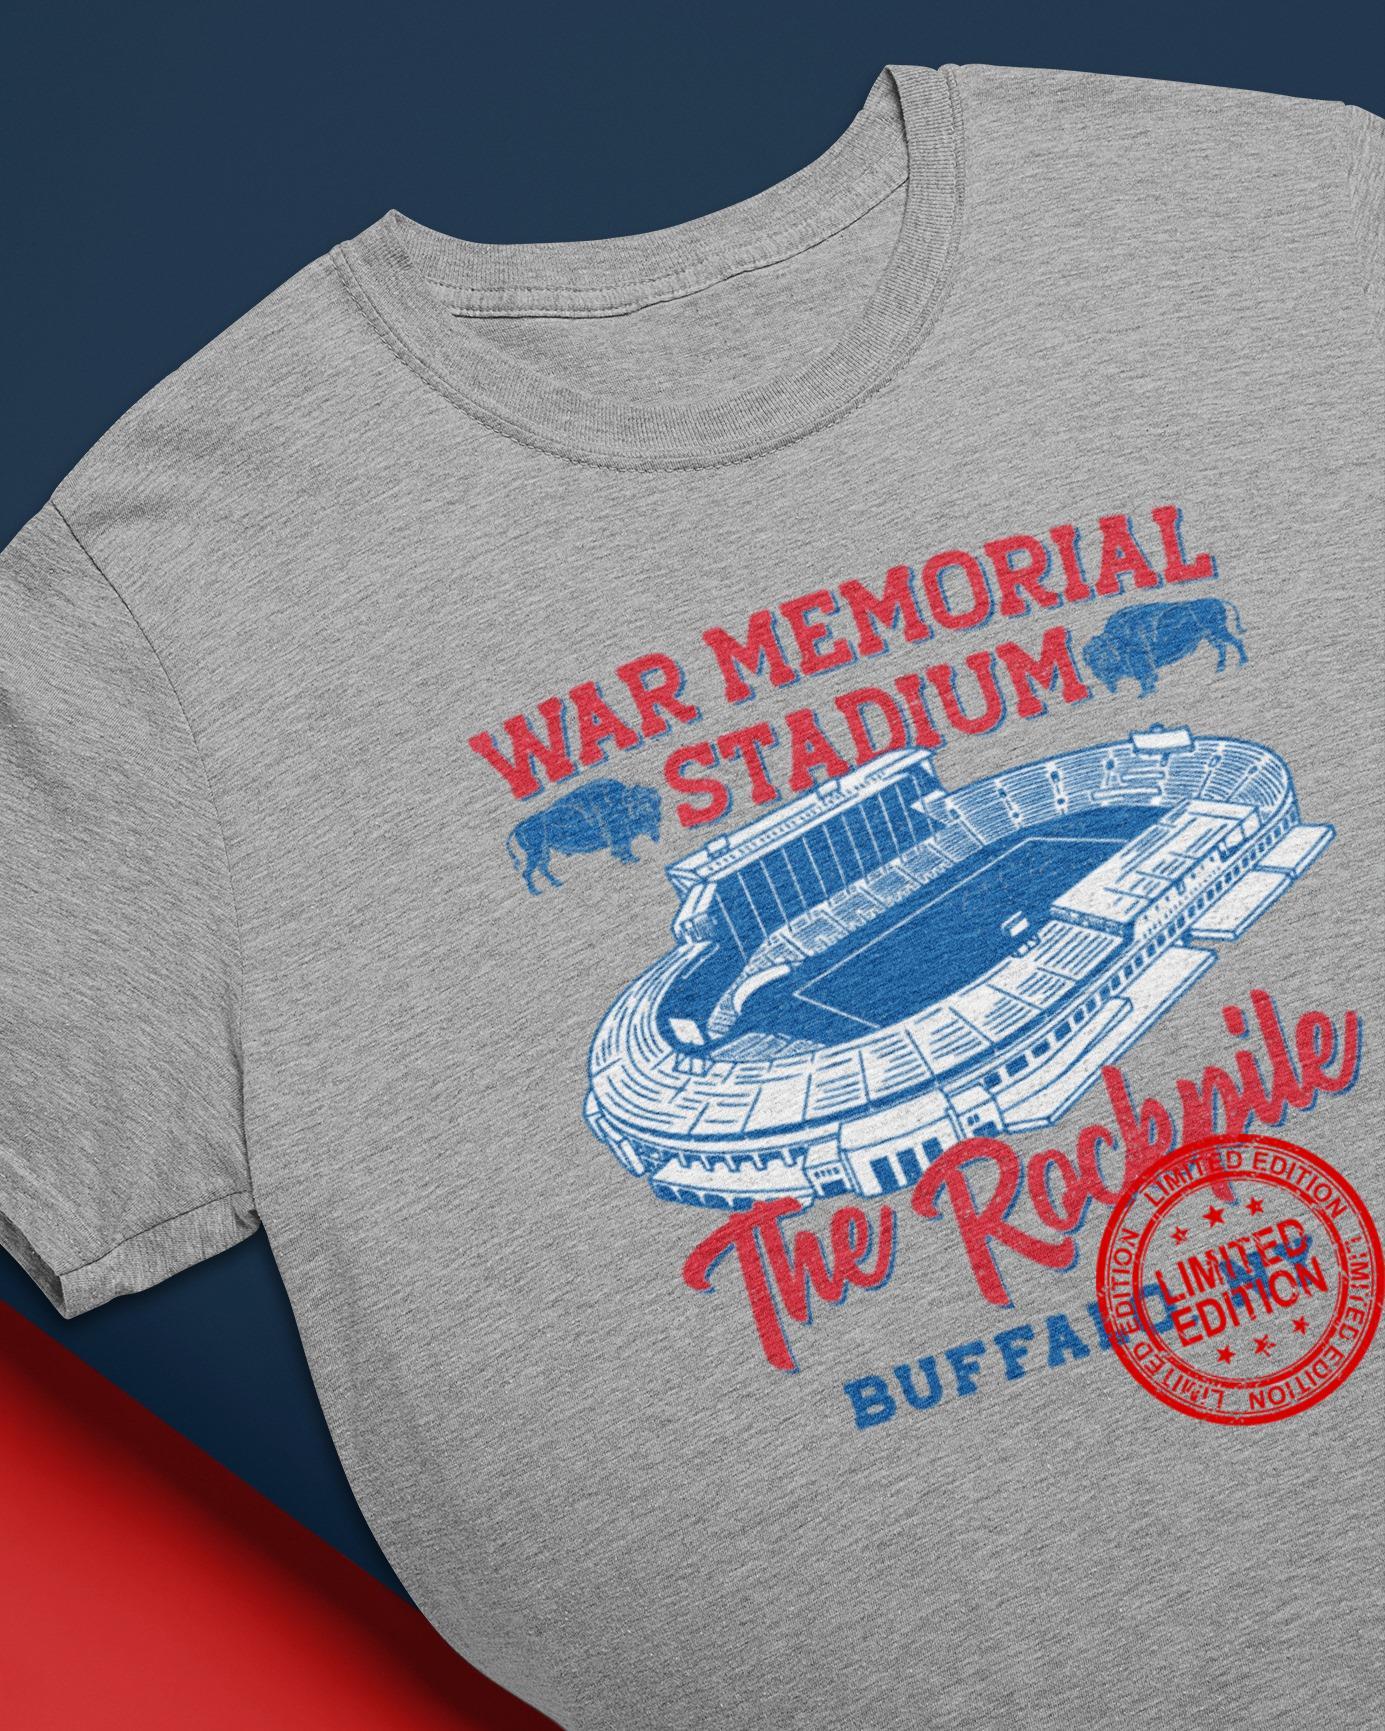 War Memorial Stadium The Rockpile Buffalo Ny Shirt